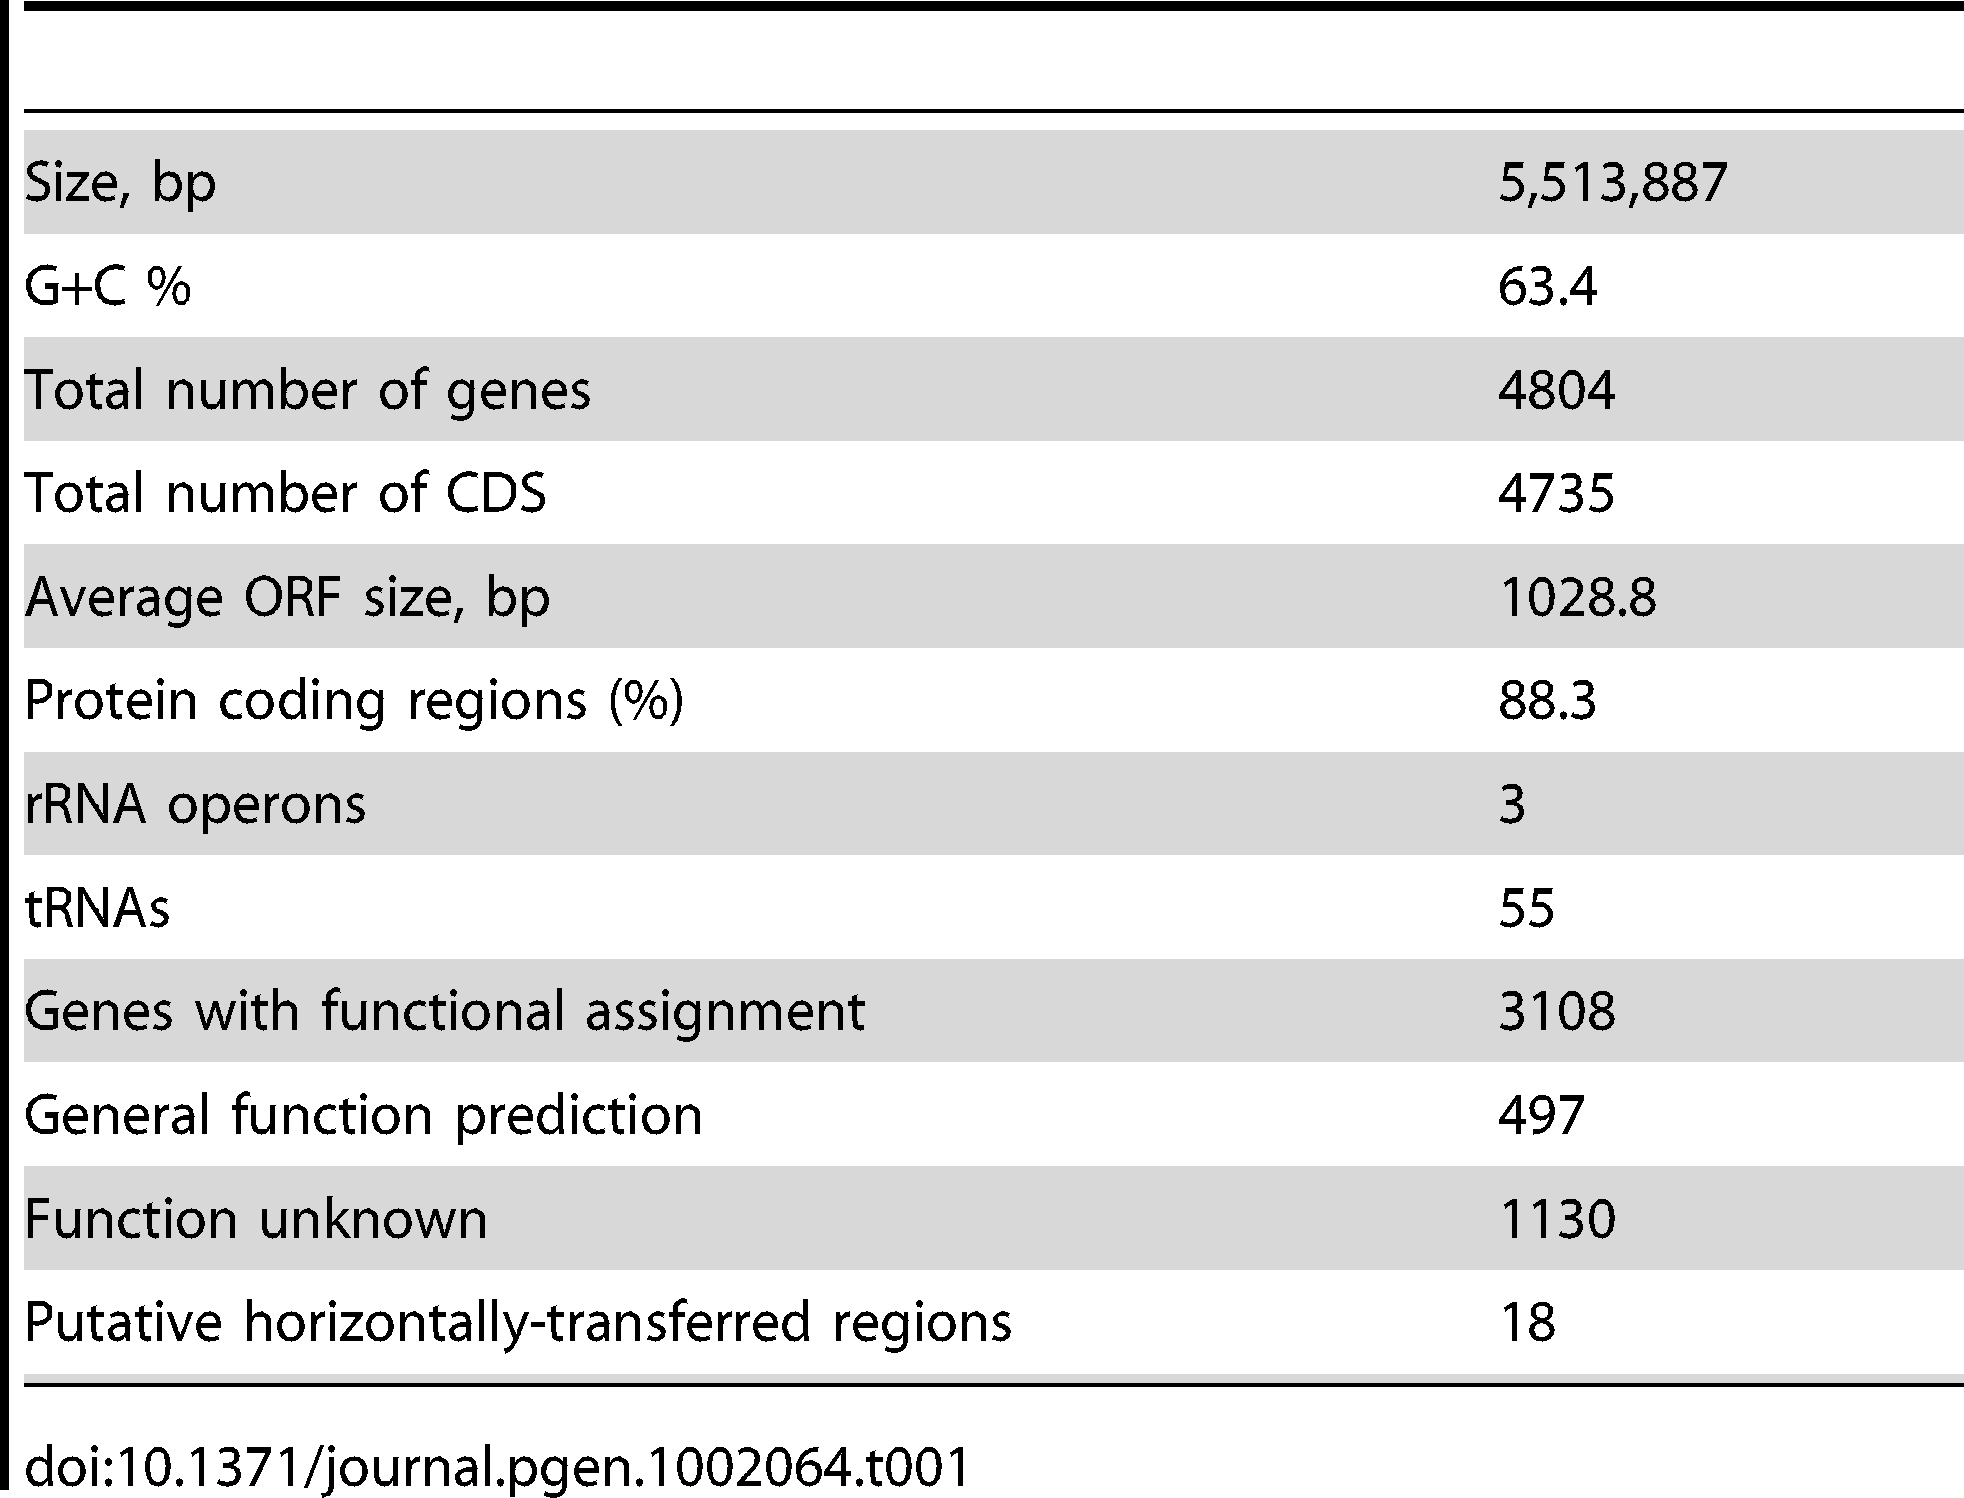 General features of the genome of <i>Herbaspirillum seropedicae</i> SmR1.